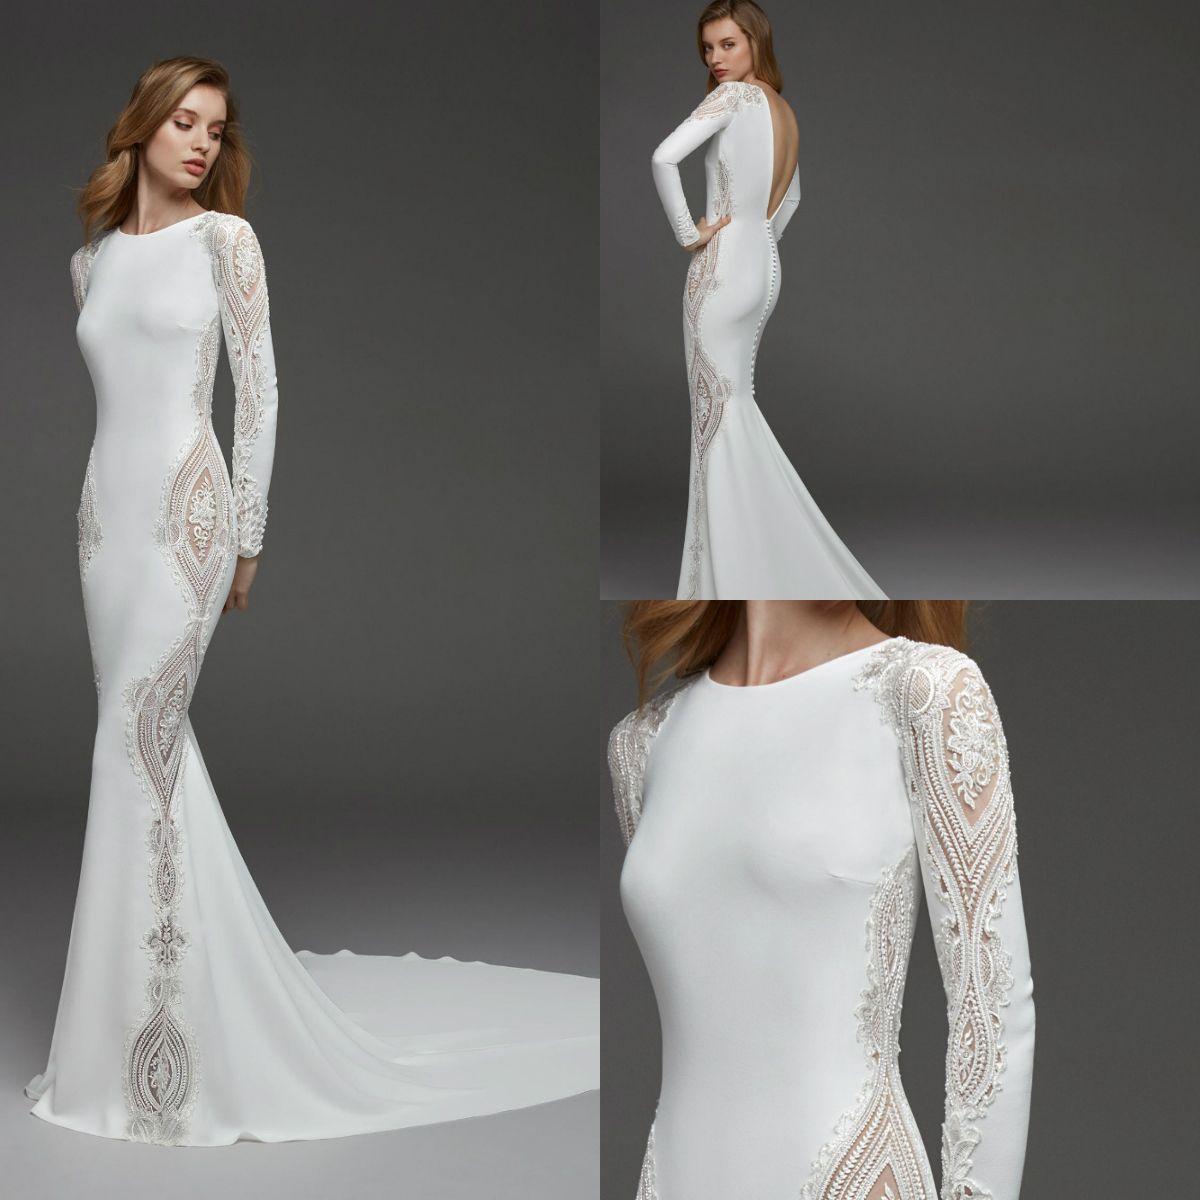 Modest Mermaid Long Sleeve Wedding Dresses Lace Appliqued Jewel Neck Custom Made Beads Bridal Wedding Gowns Vestido de Noiva